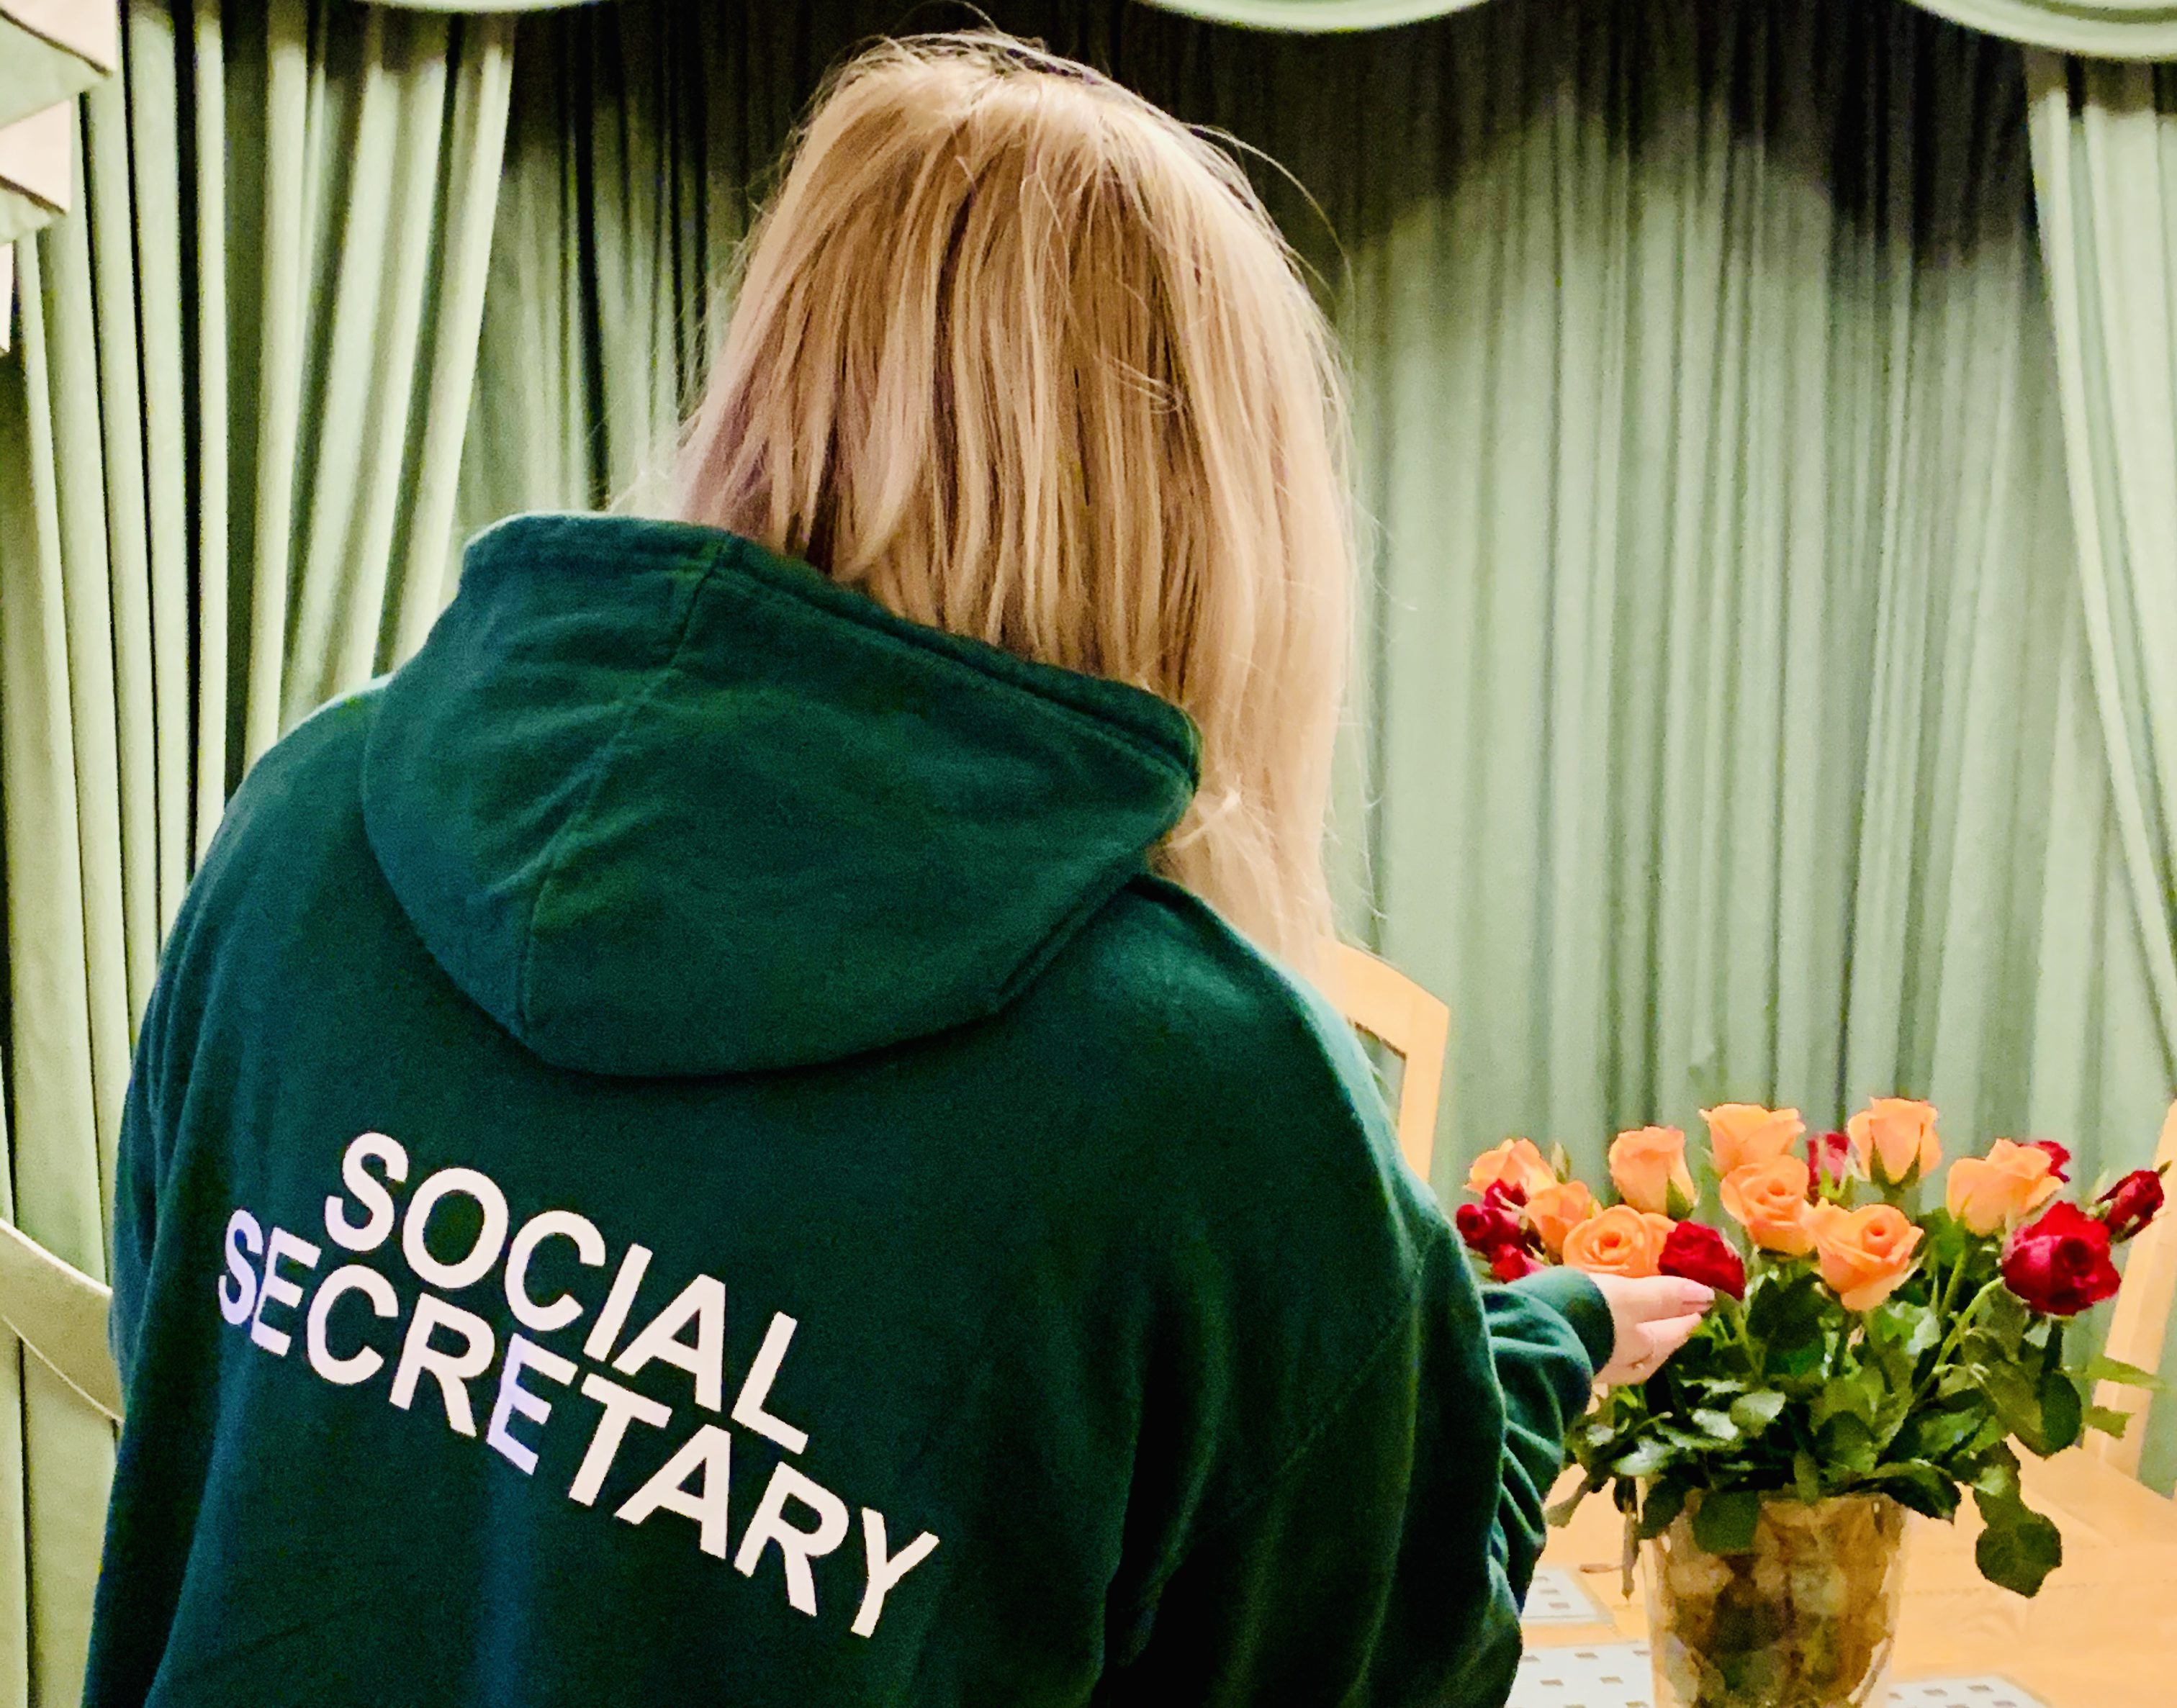 Social secretary